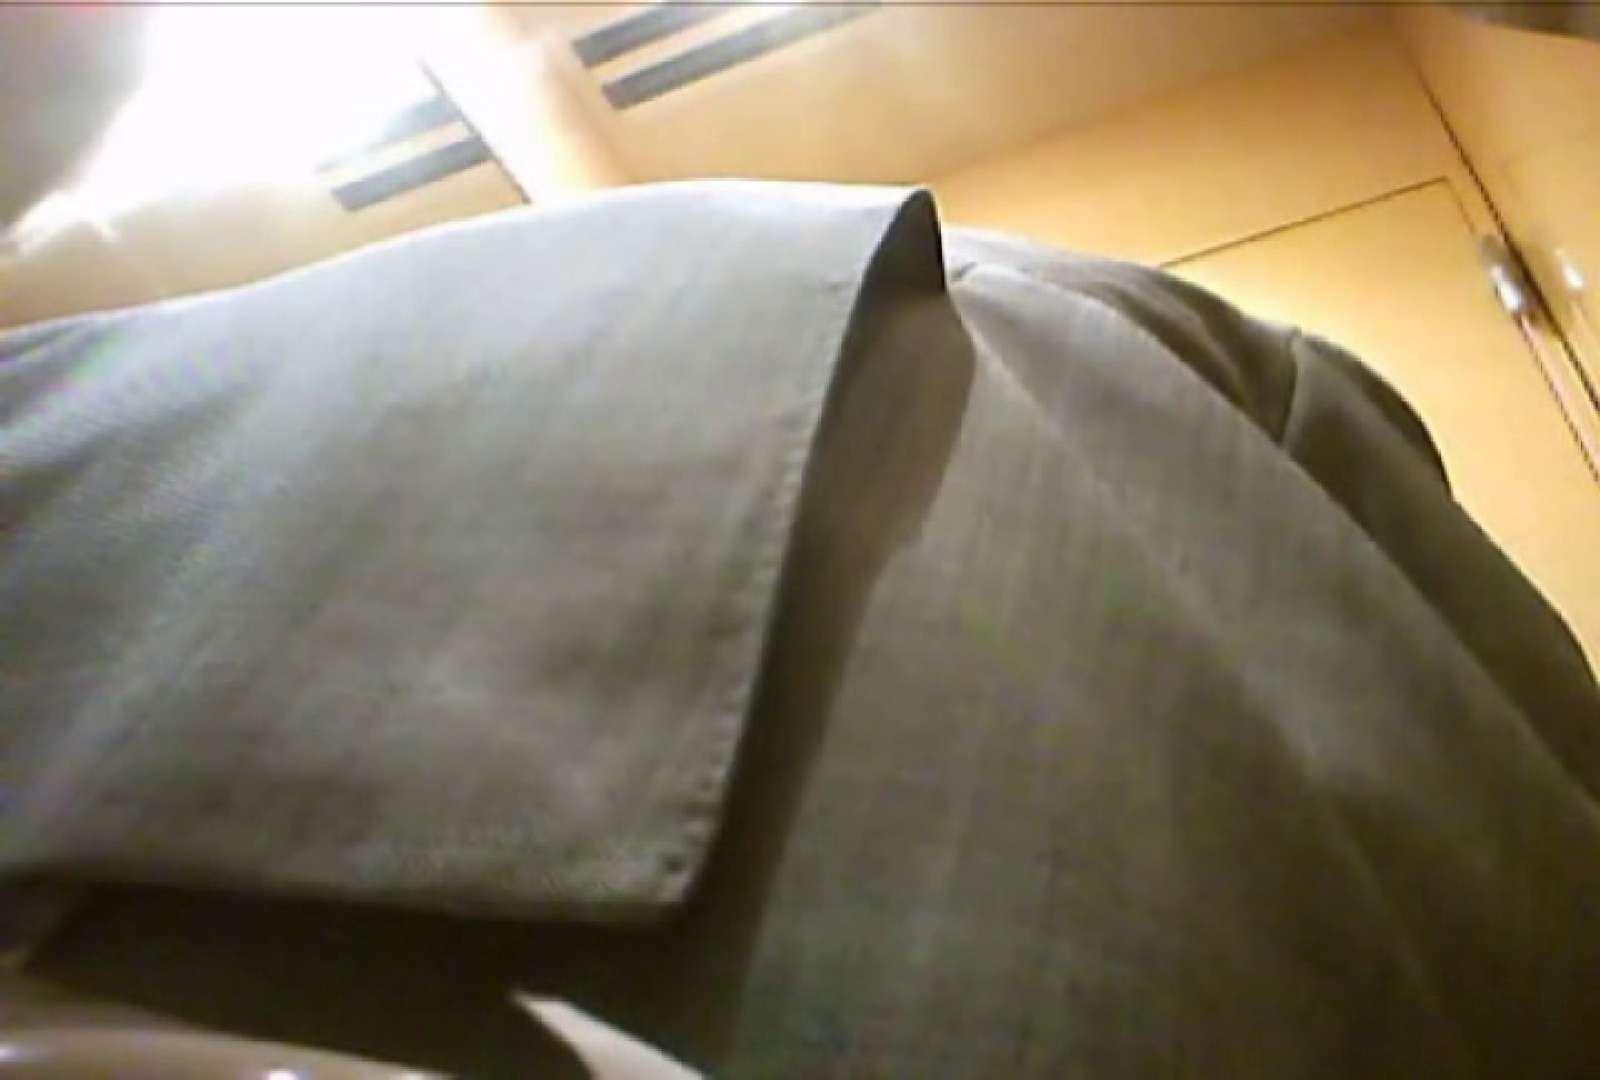 SEASON 2ND!掴み取りさんの洗面所覗き!in新幹線!VOL.02 スーツボーイズ | ノンケボーイズ  82pic 31